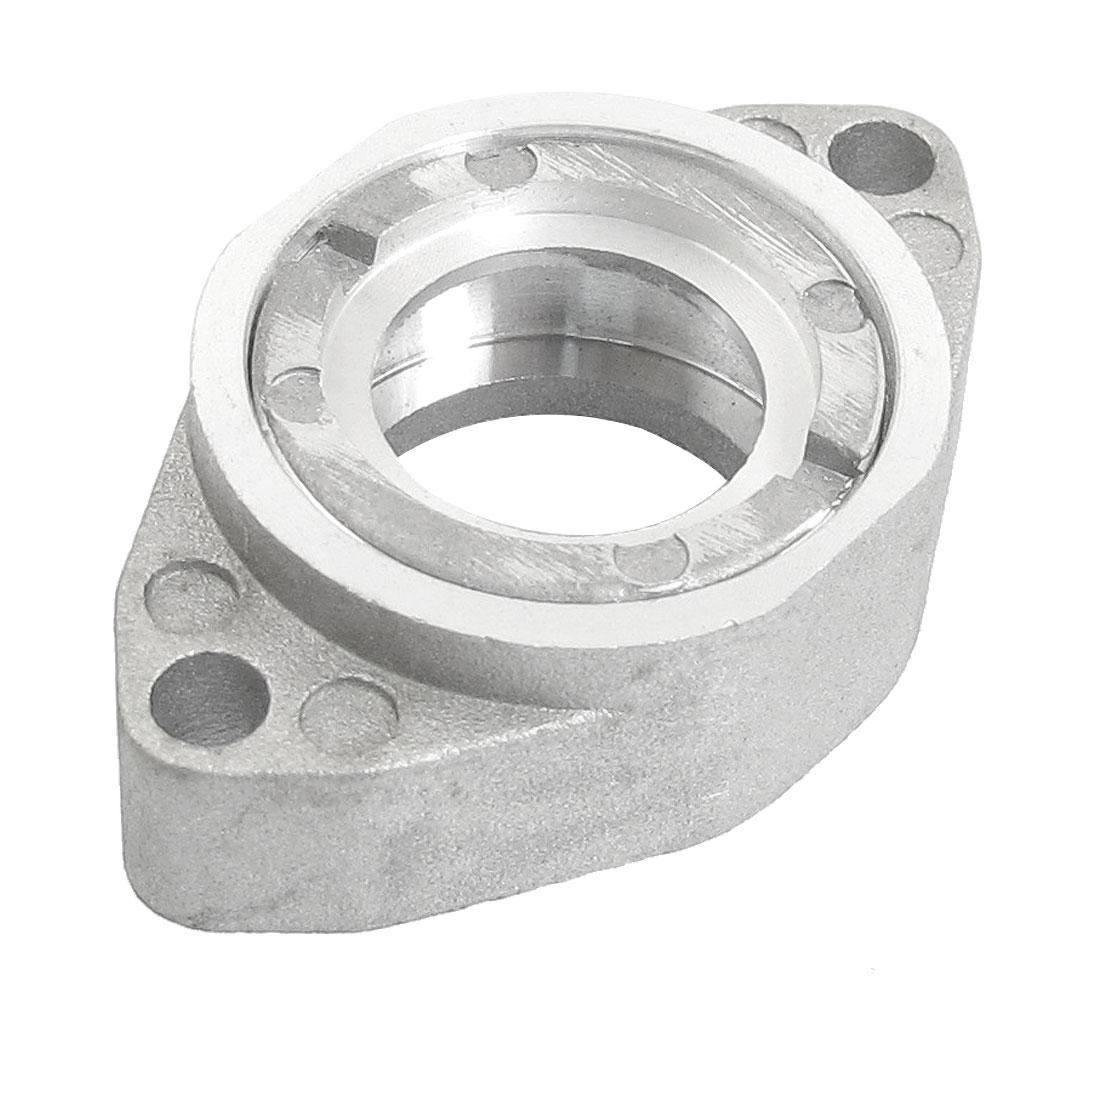 Silver Tone Aluminum Cutting Machine Repair Part Bearing Seat